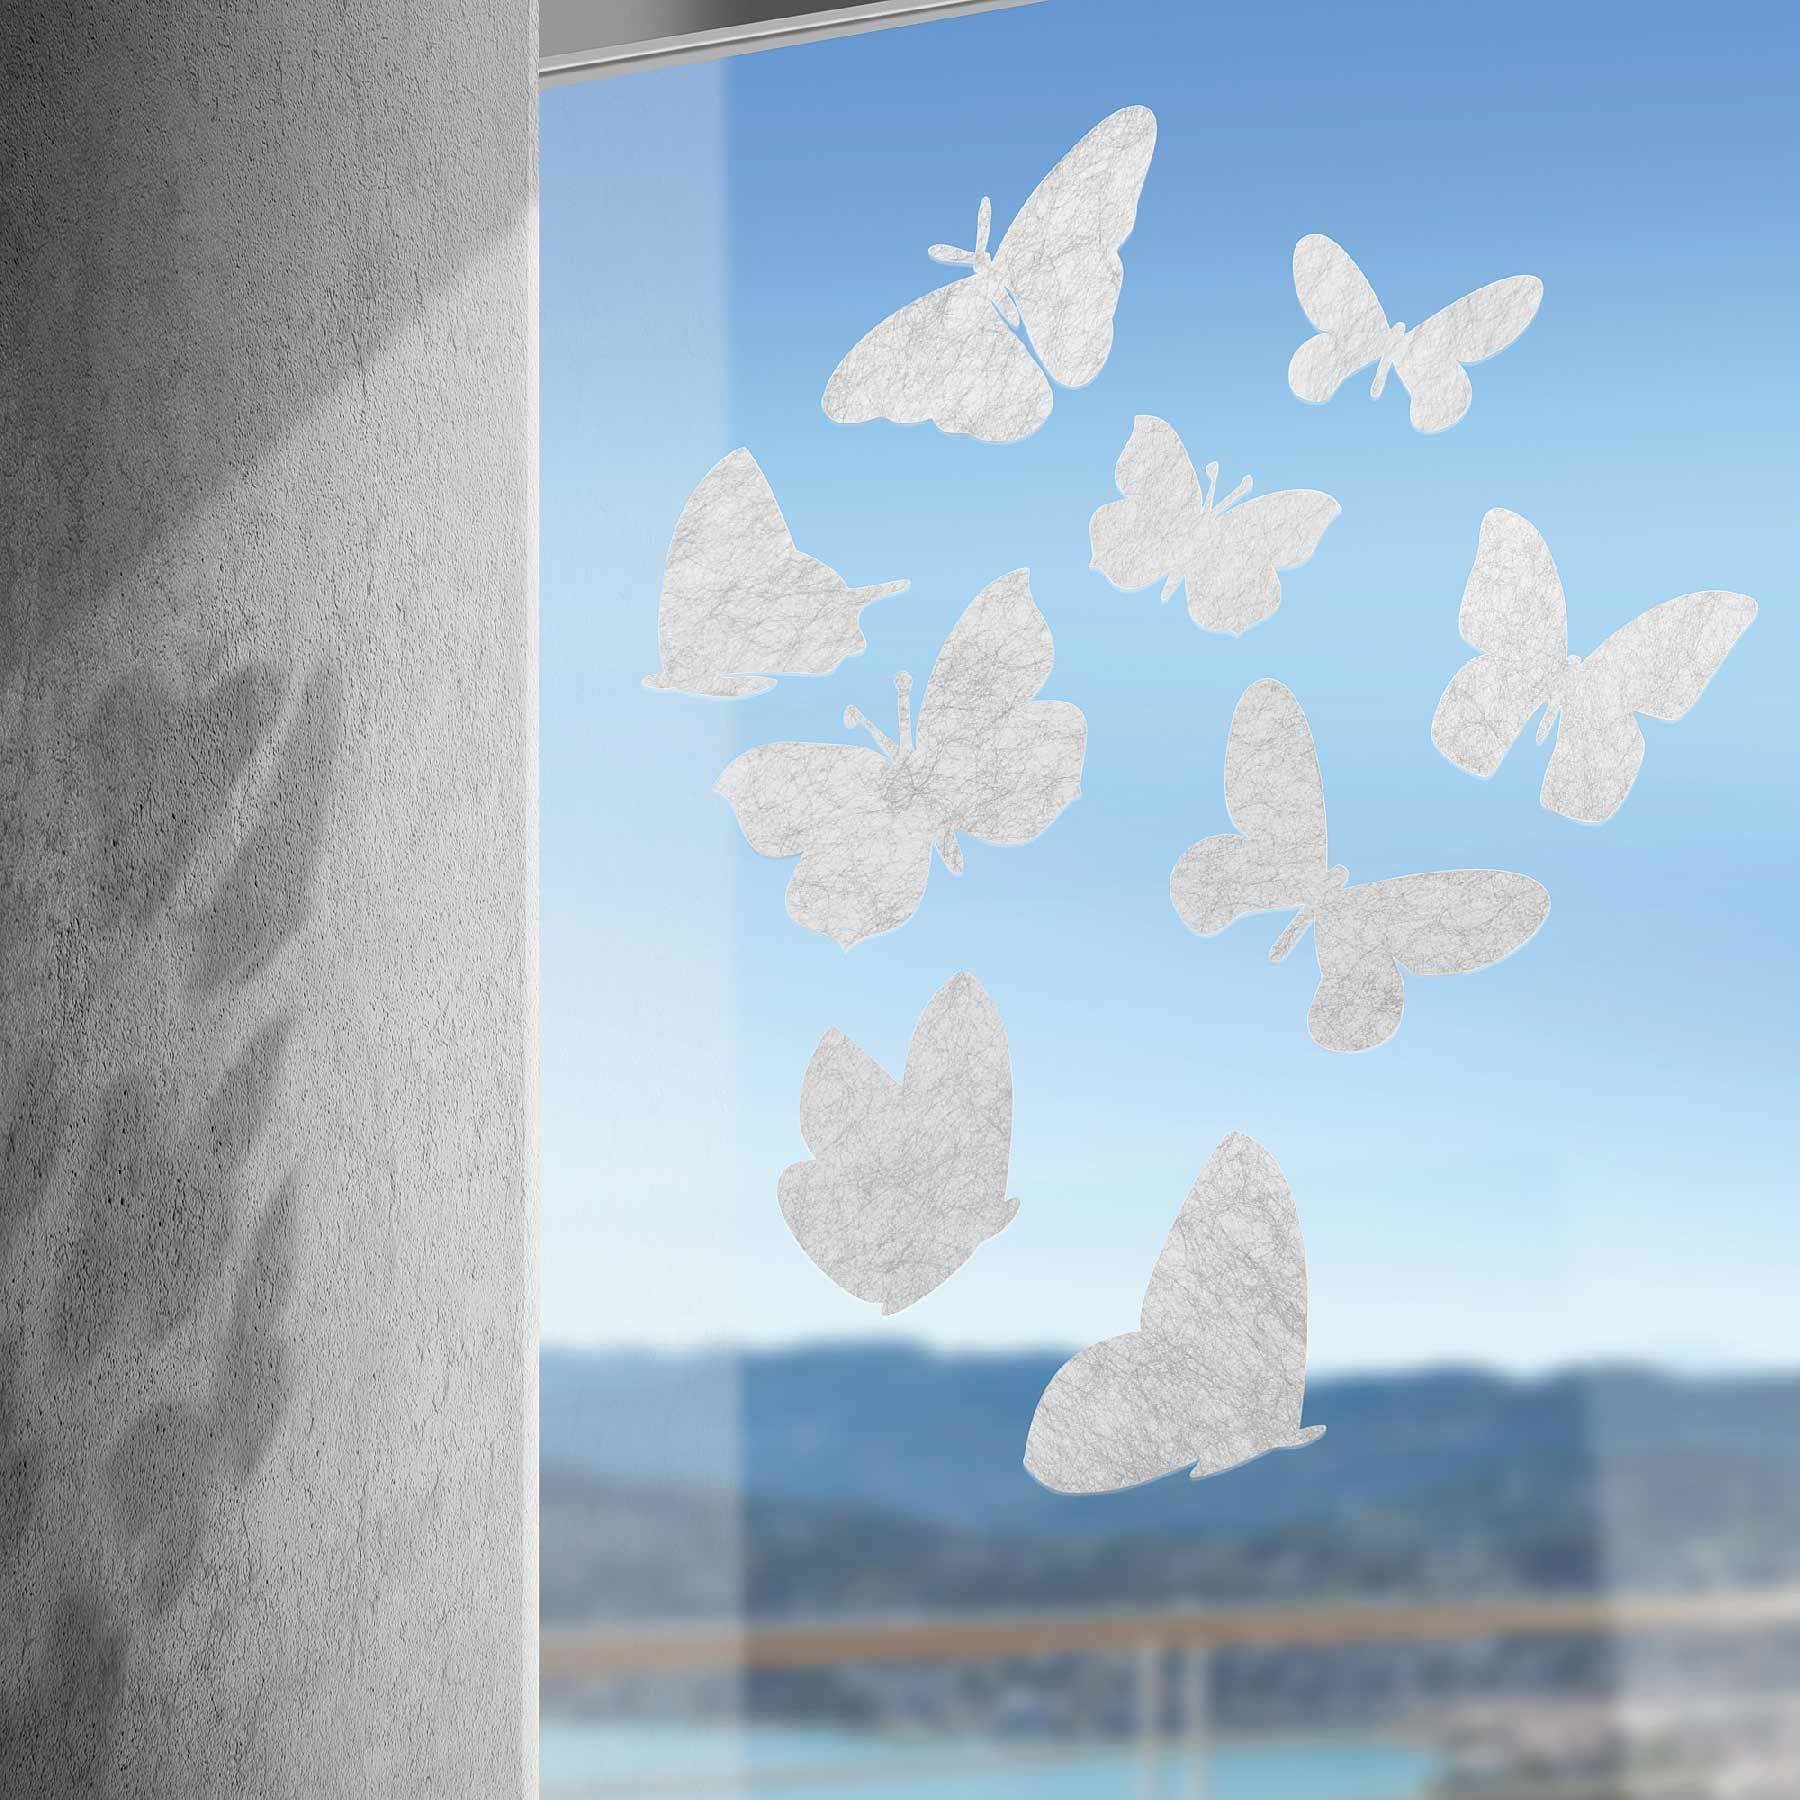 gecko farfalla weiss creation baumann 01